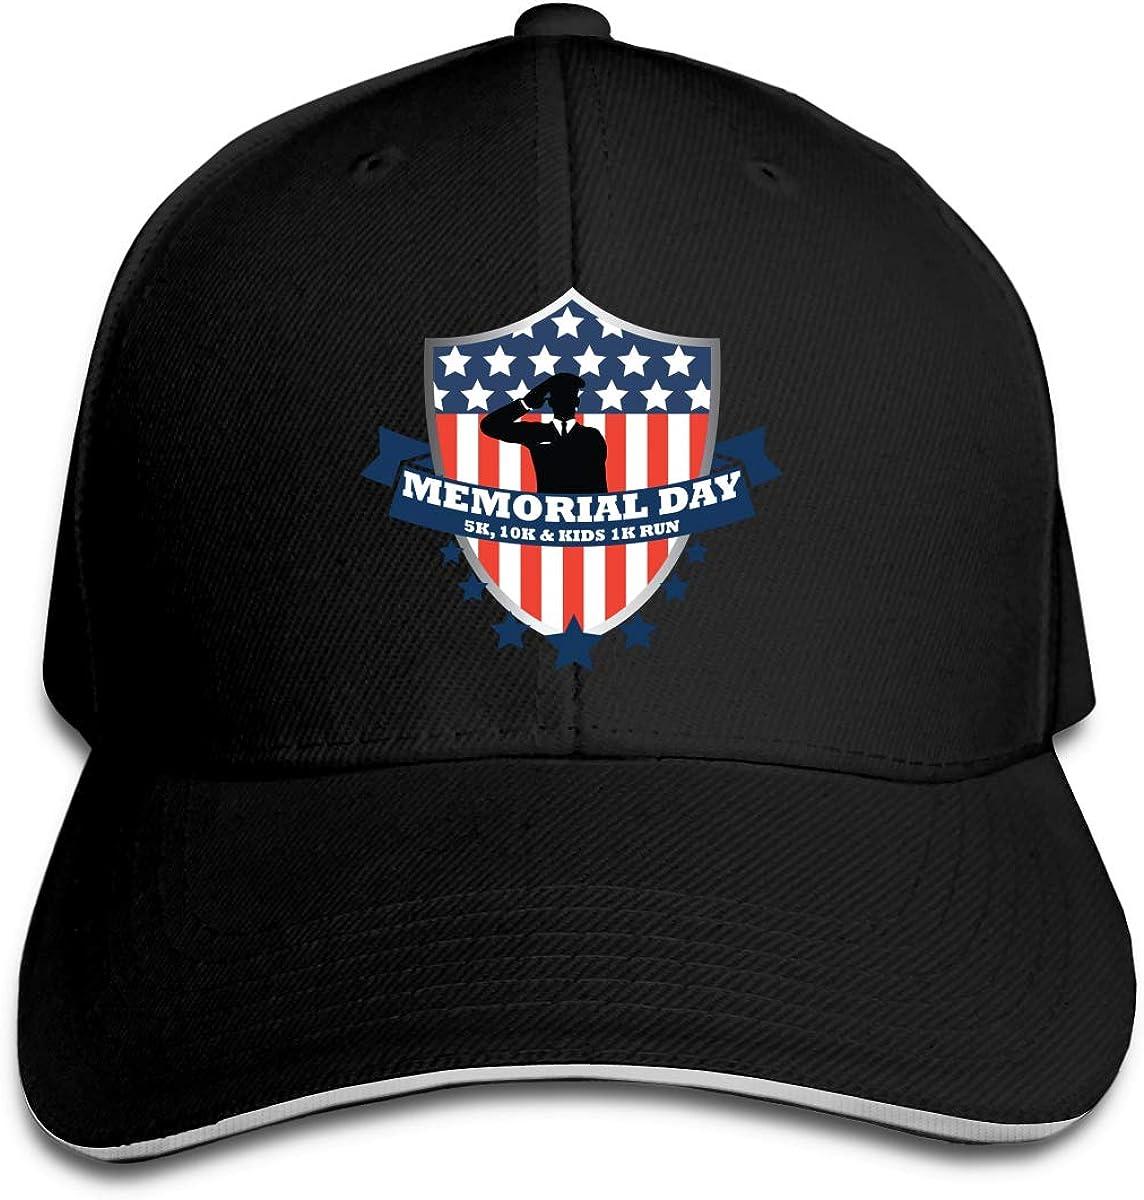 Memorial Day Classic Adjustable Cotton Baseball Caps Trucker Driver Hat Outdoor Cap Black